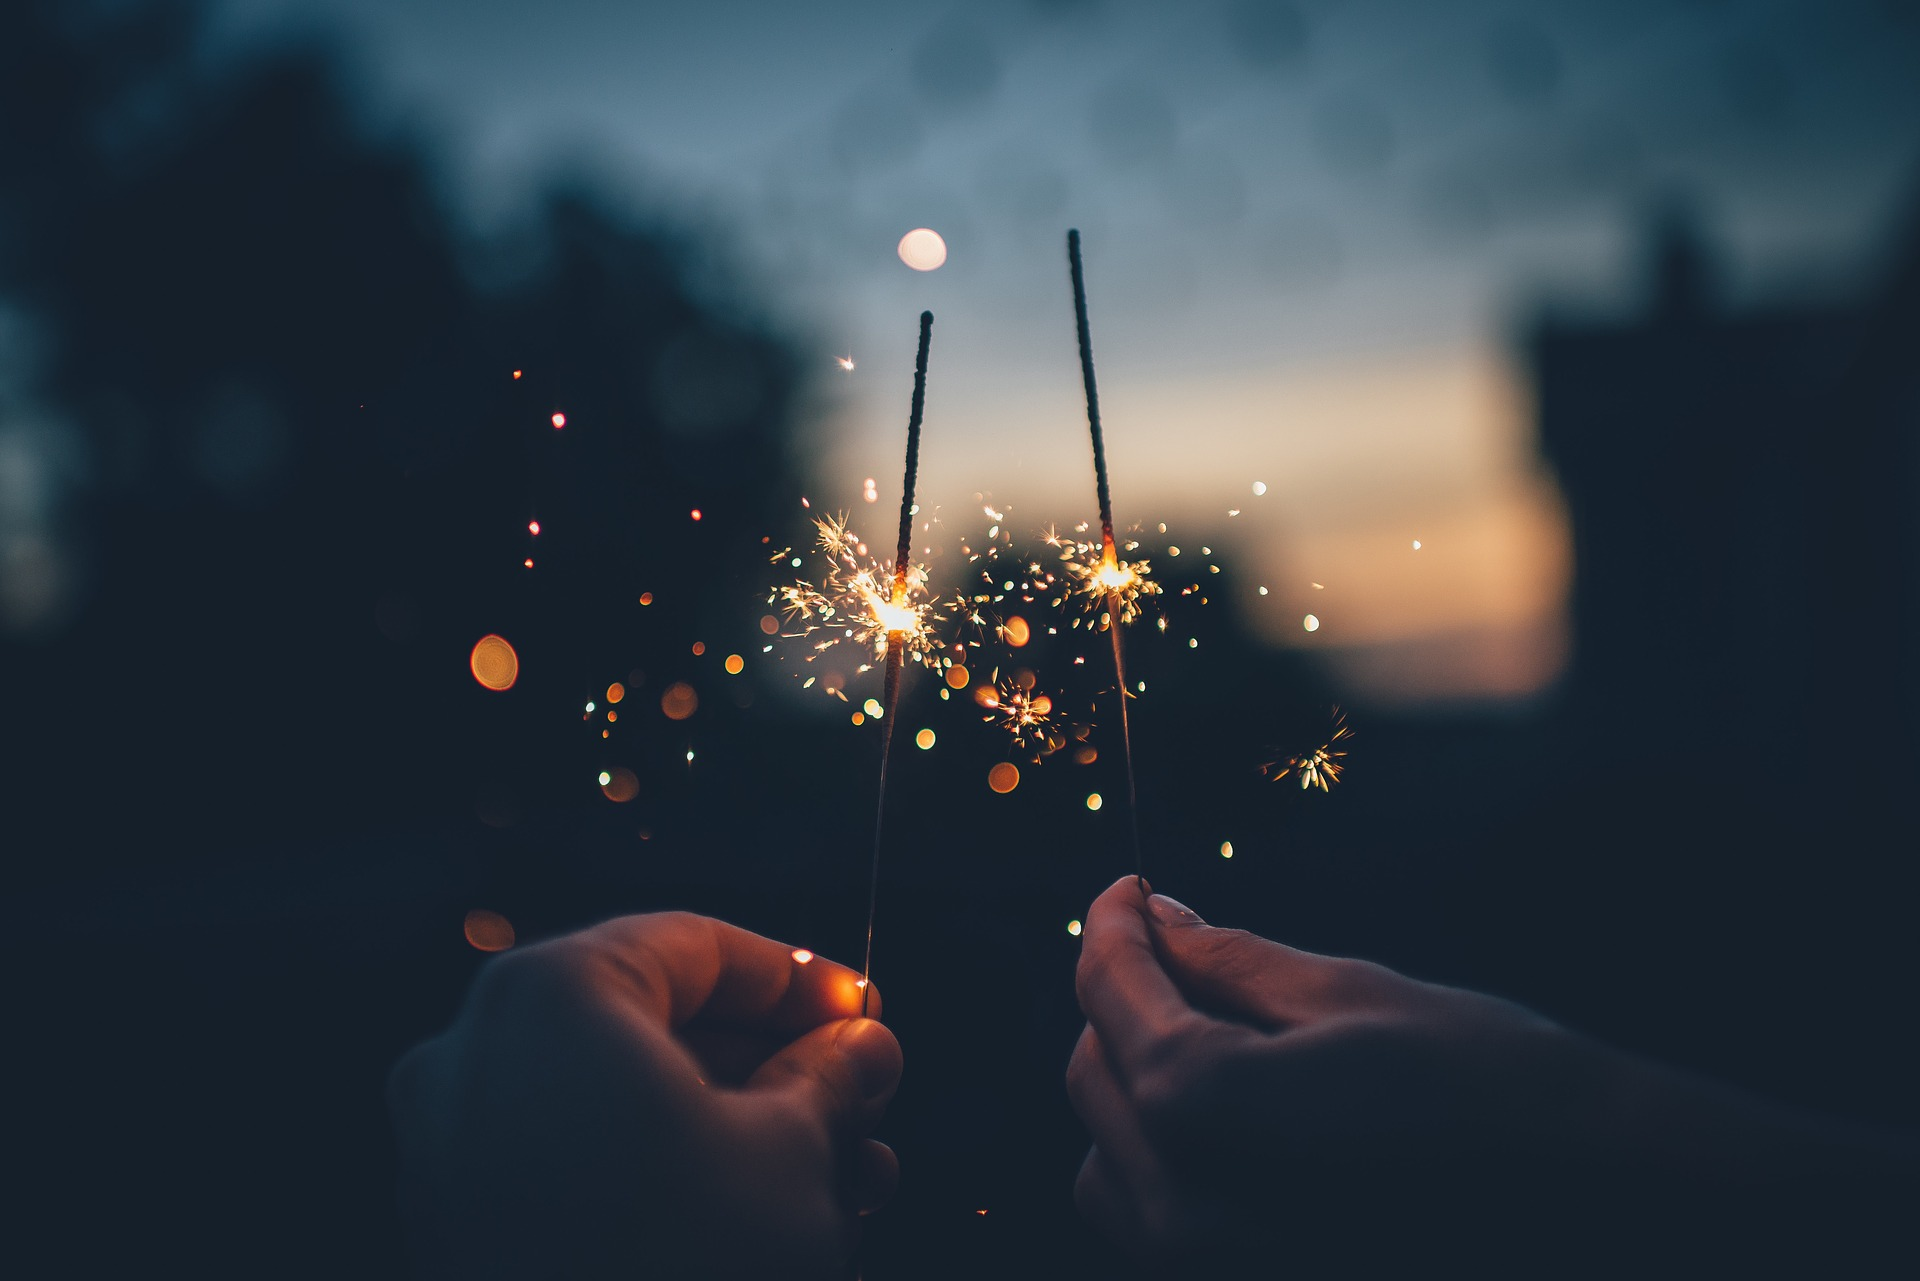 celebrating_life.jpg